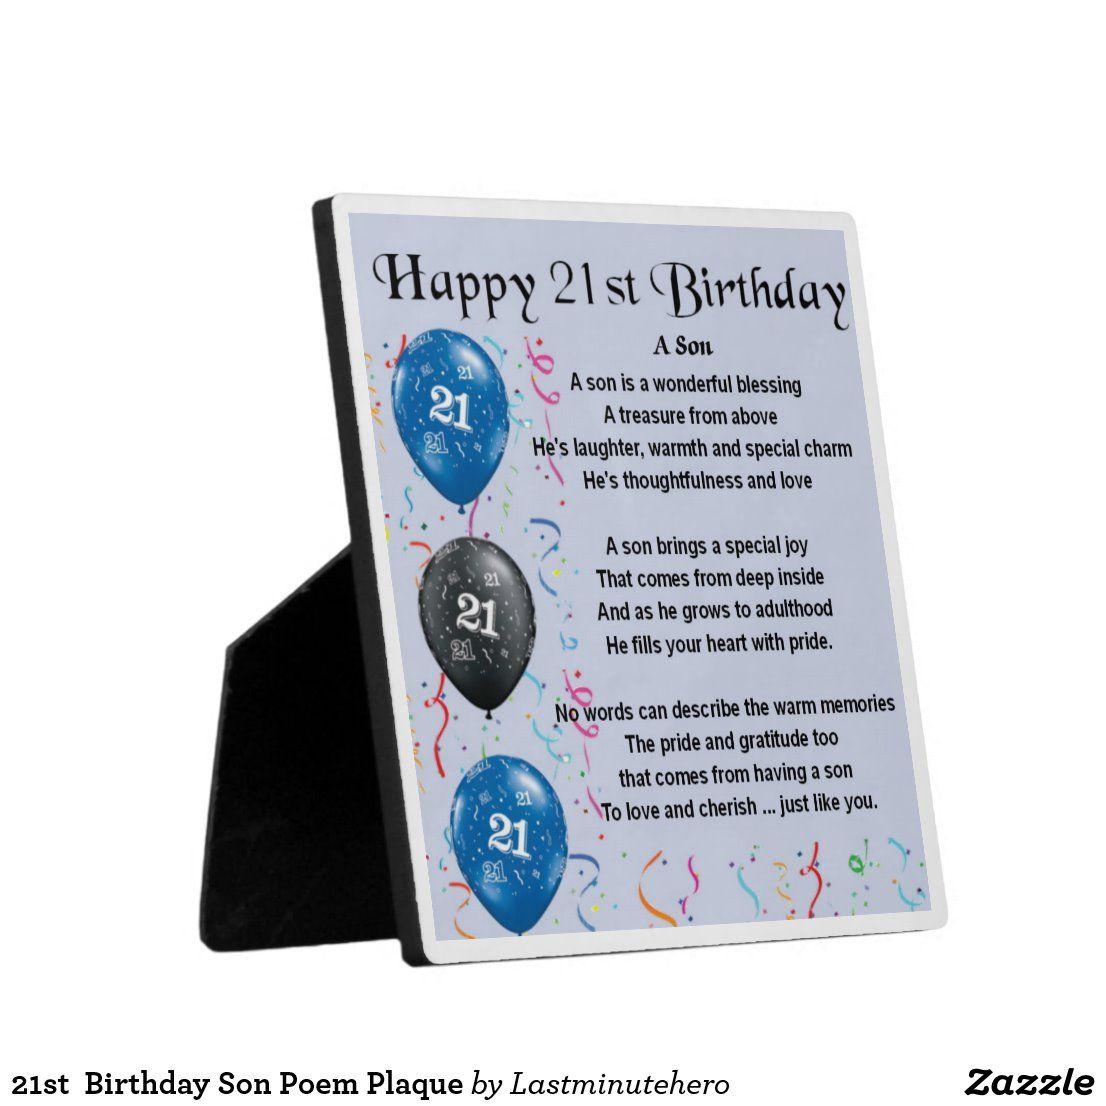 21st Birthday Son Poem Plaque Zazzle.co.uk Son poems